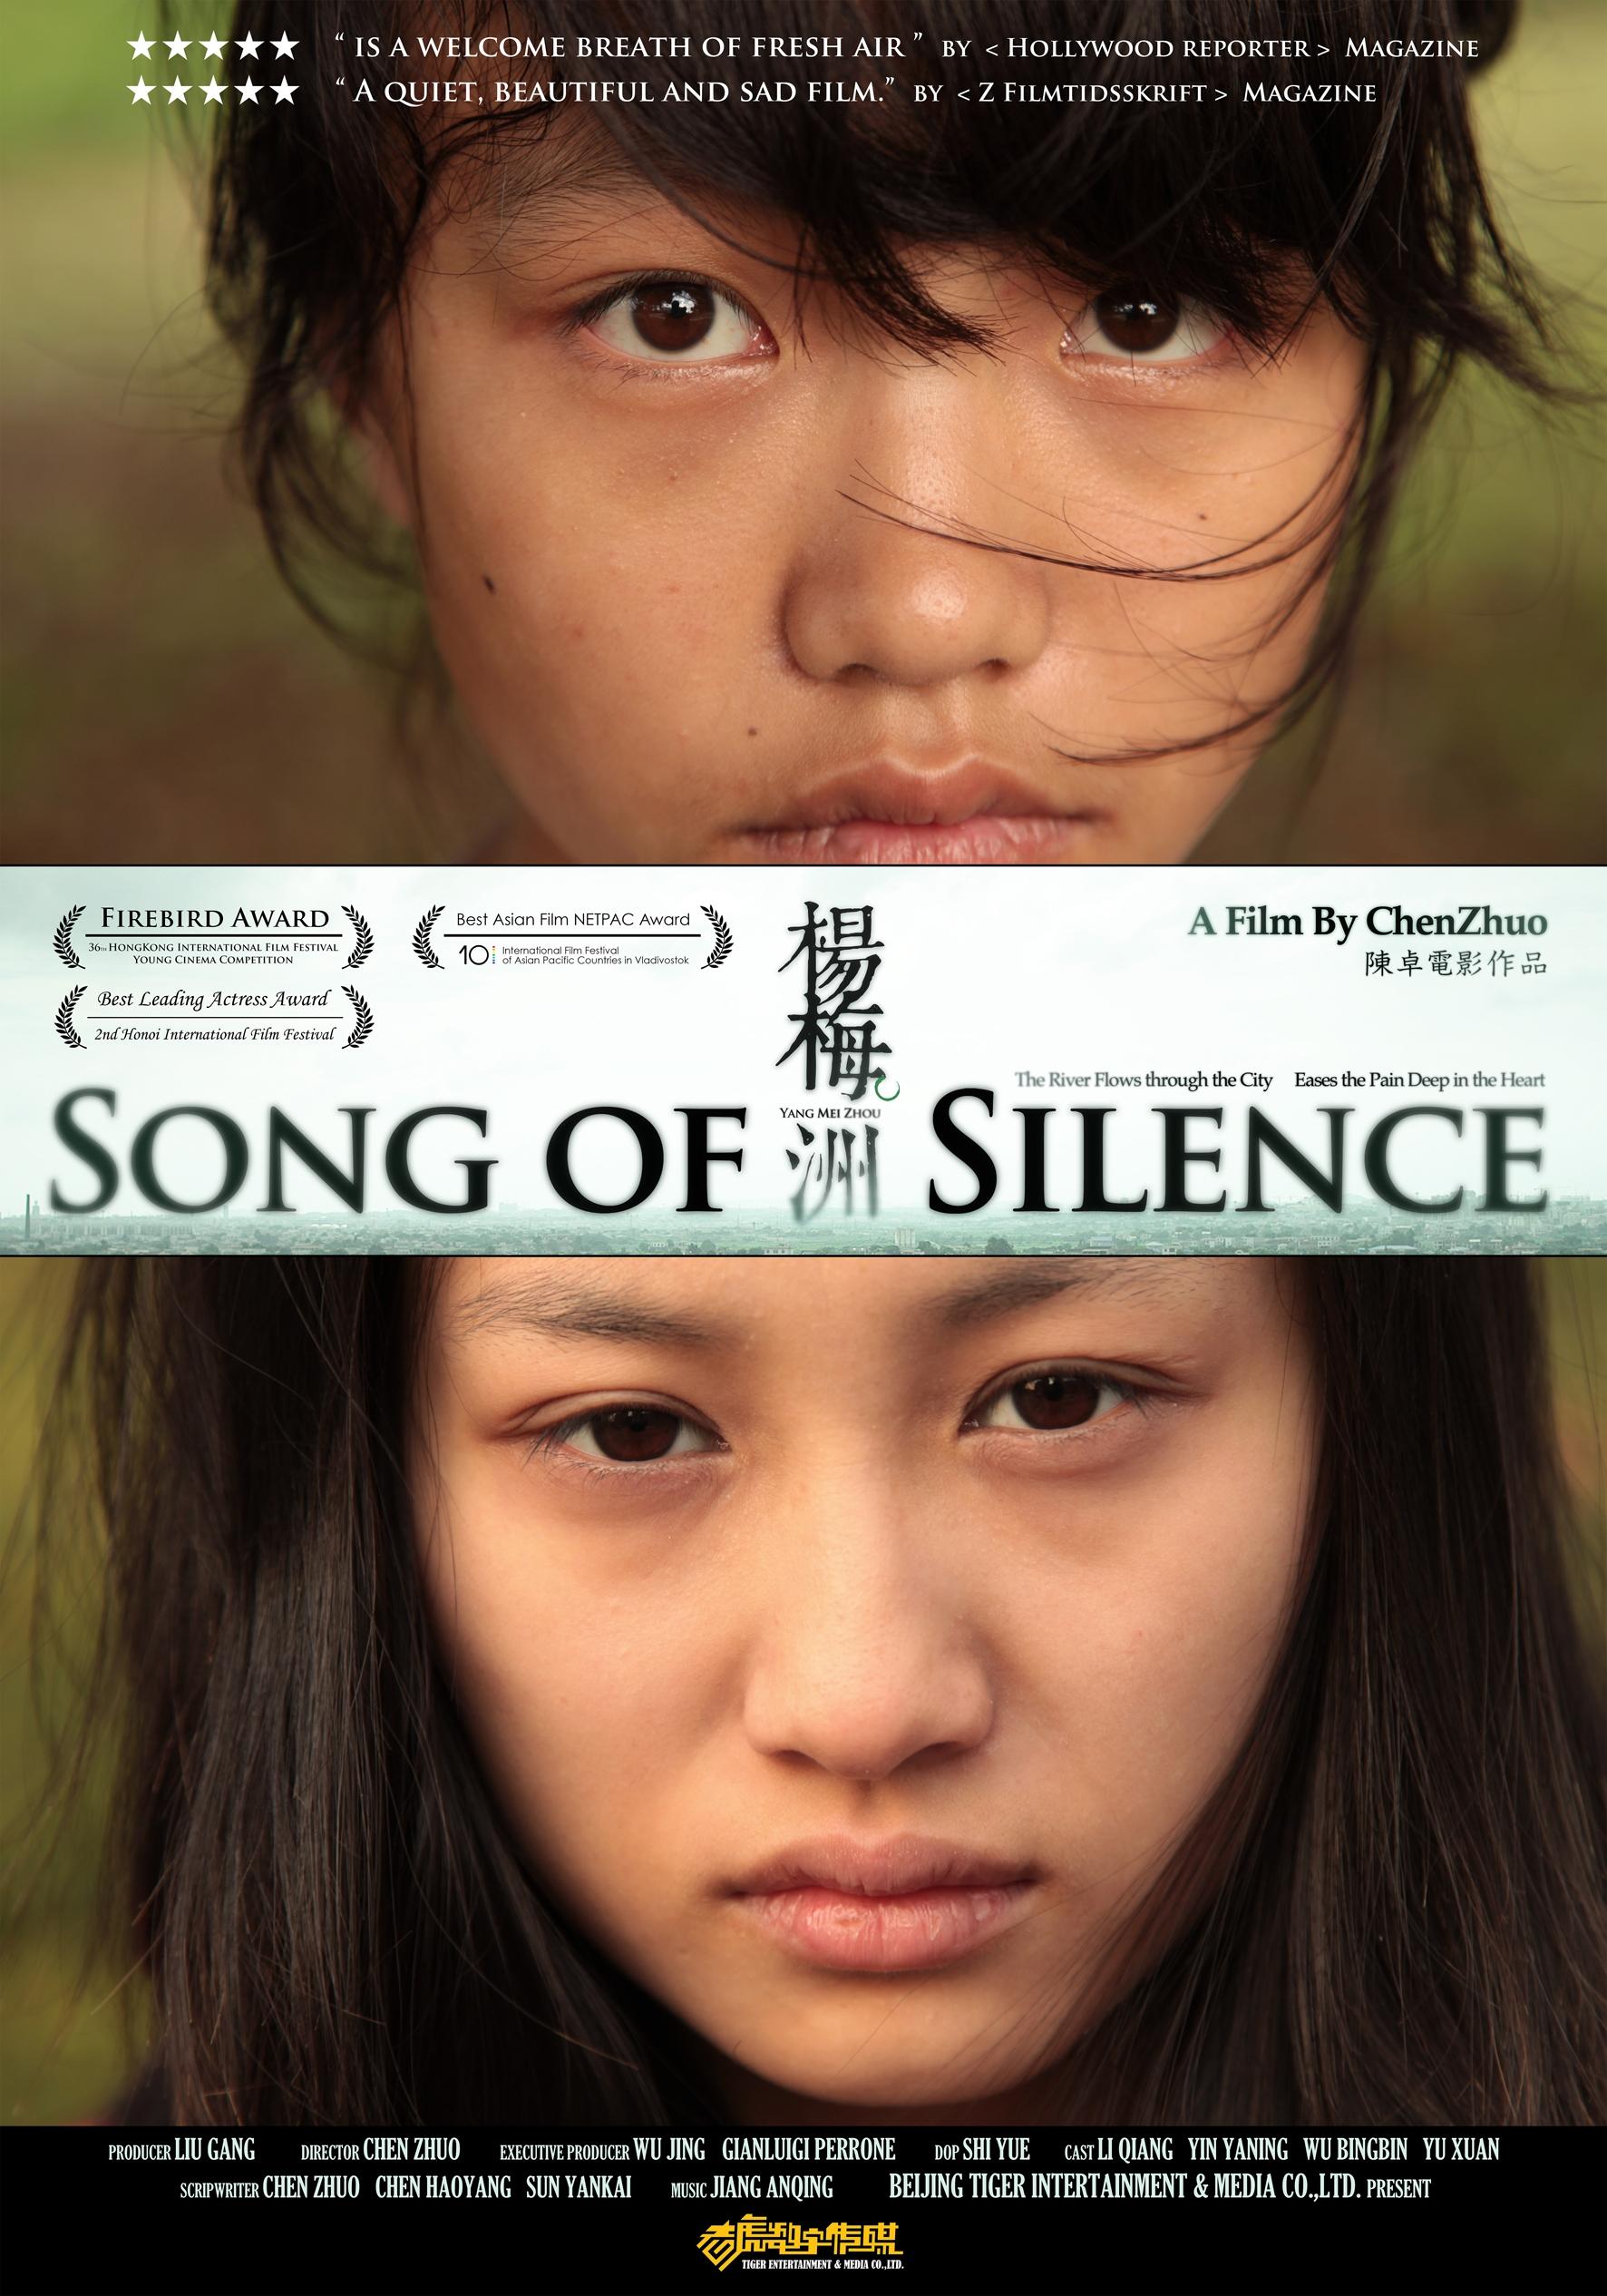 Song of Silence: la locandina internazionale